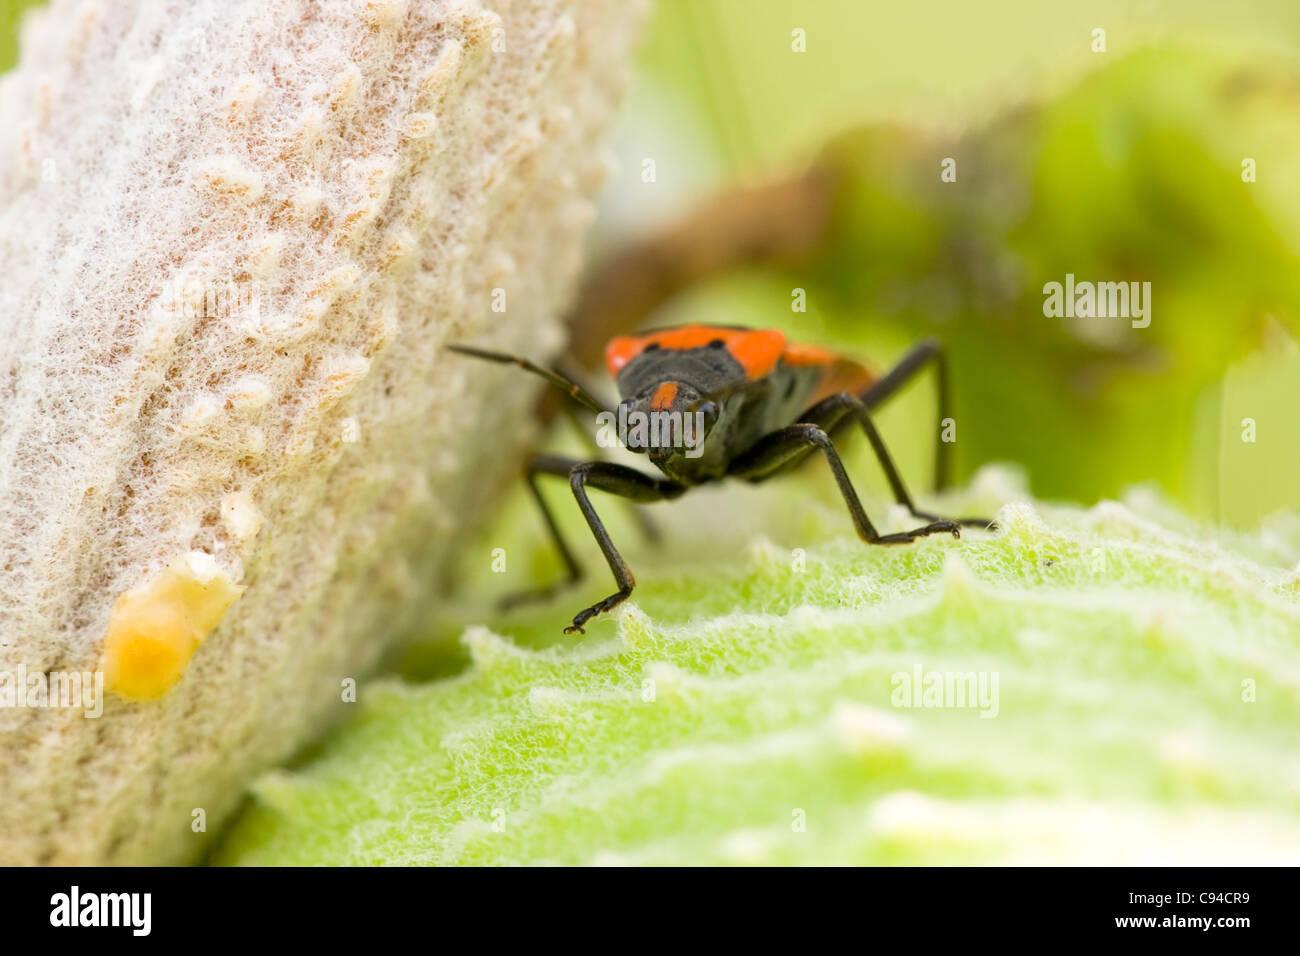 Small Eastern Milkweed Bug (Lygaeus turcicus) on a Common Milkweed (Asclepias syriaca) plant. Stock Photo